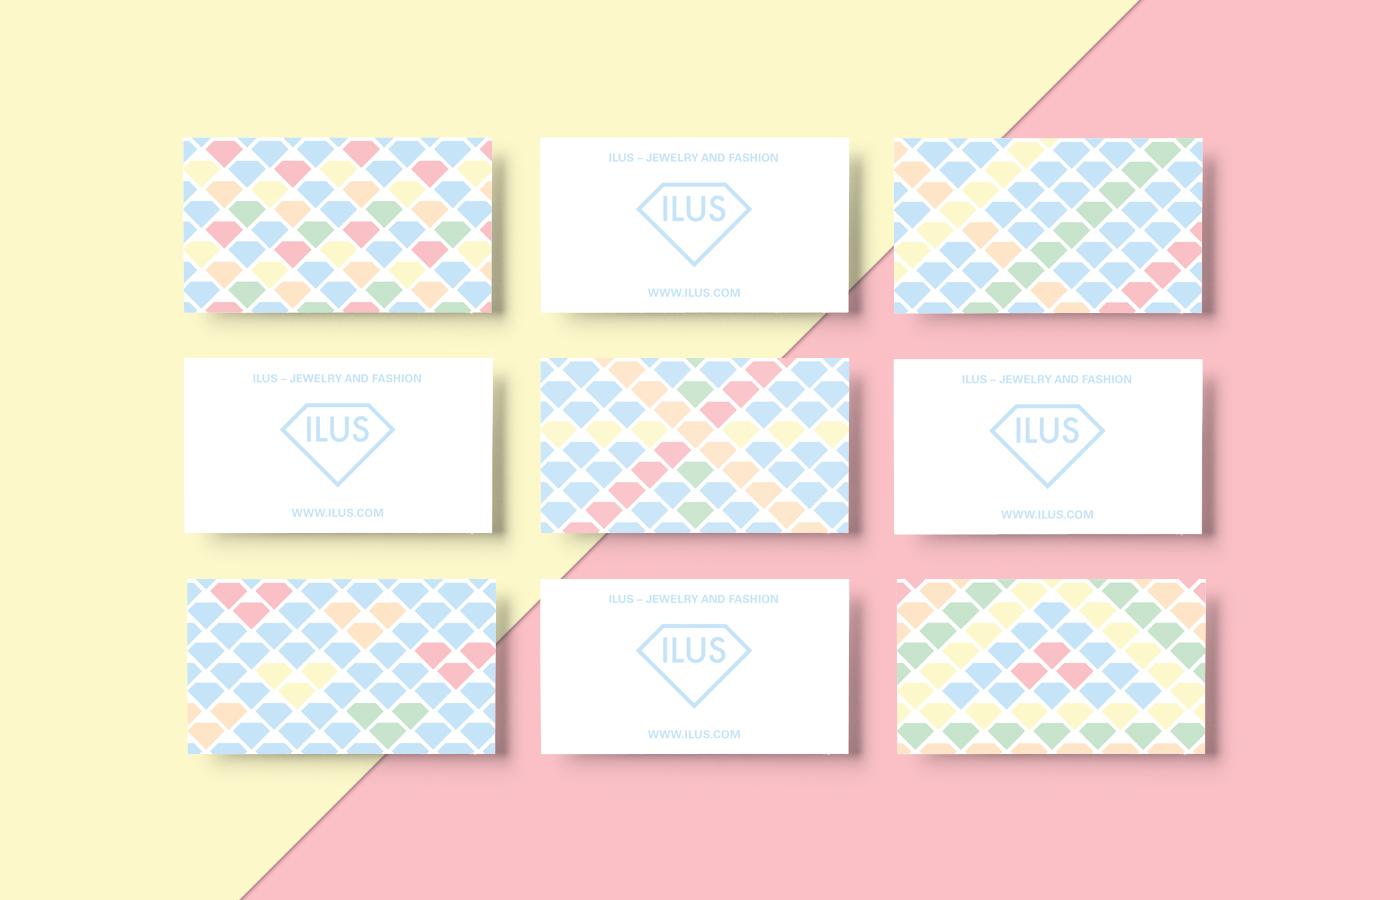 branding  Corporate Design Fashion  jewelry bags cards stationary munich Label logo